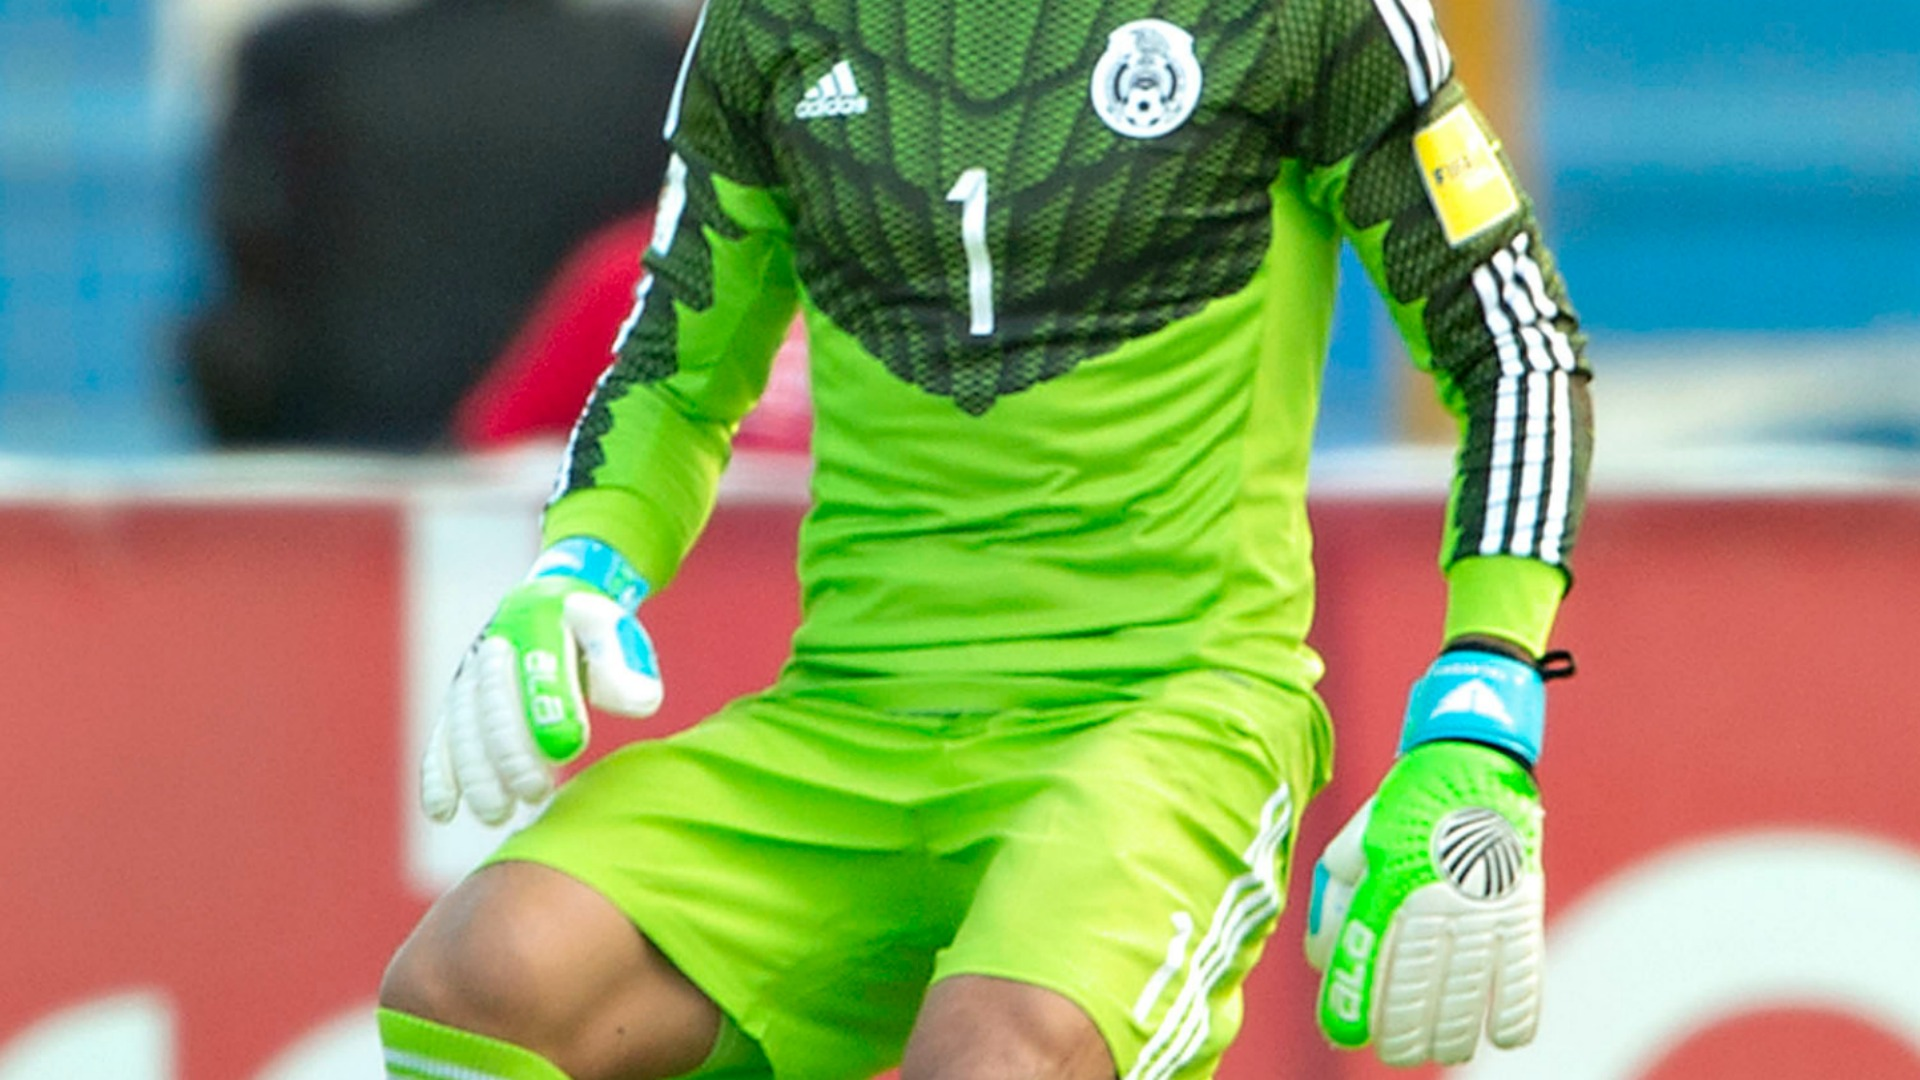 Uniforme de portero de la Selección Mexicana - Goal.com